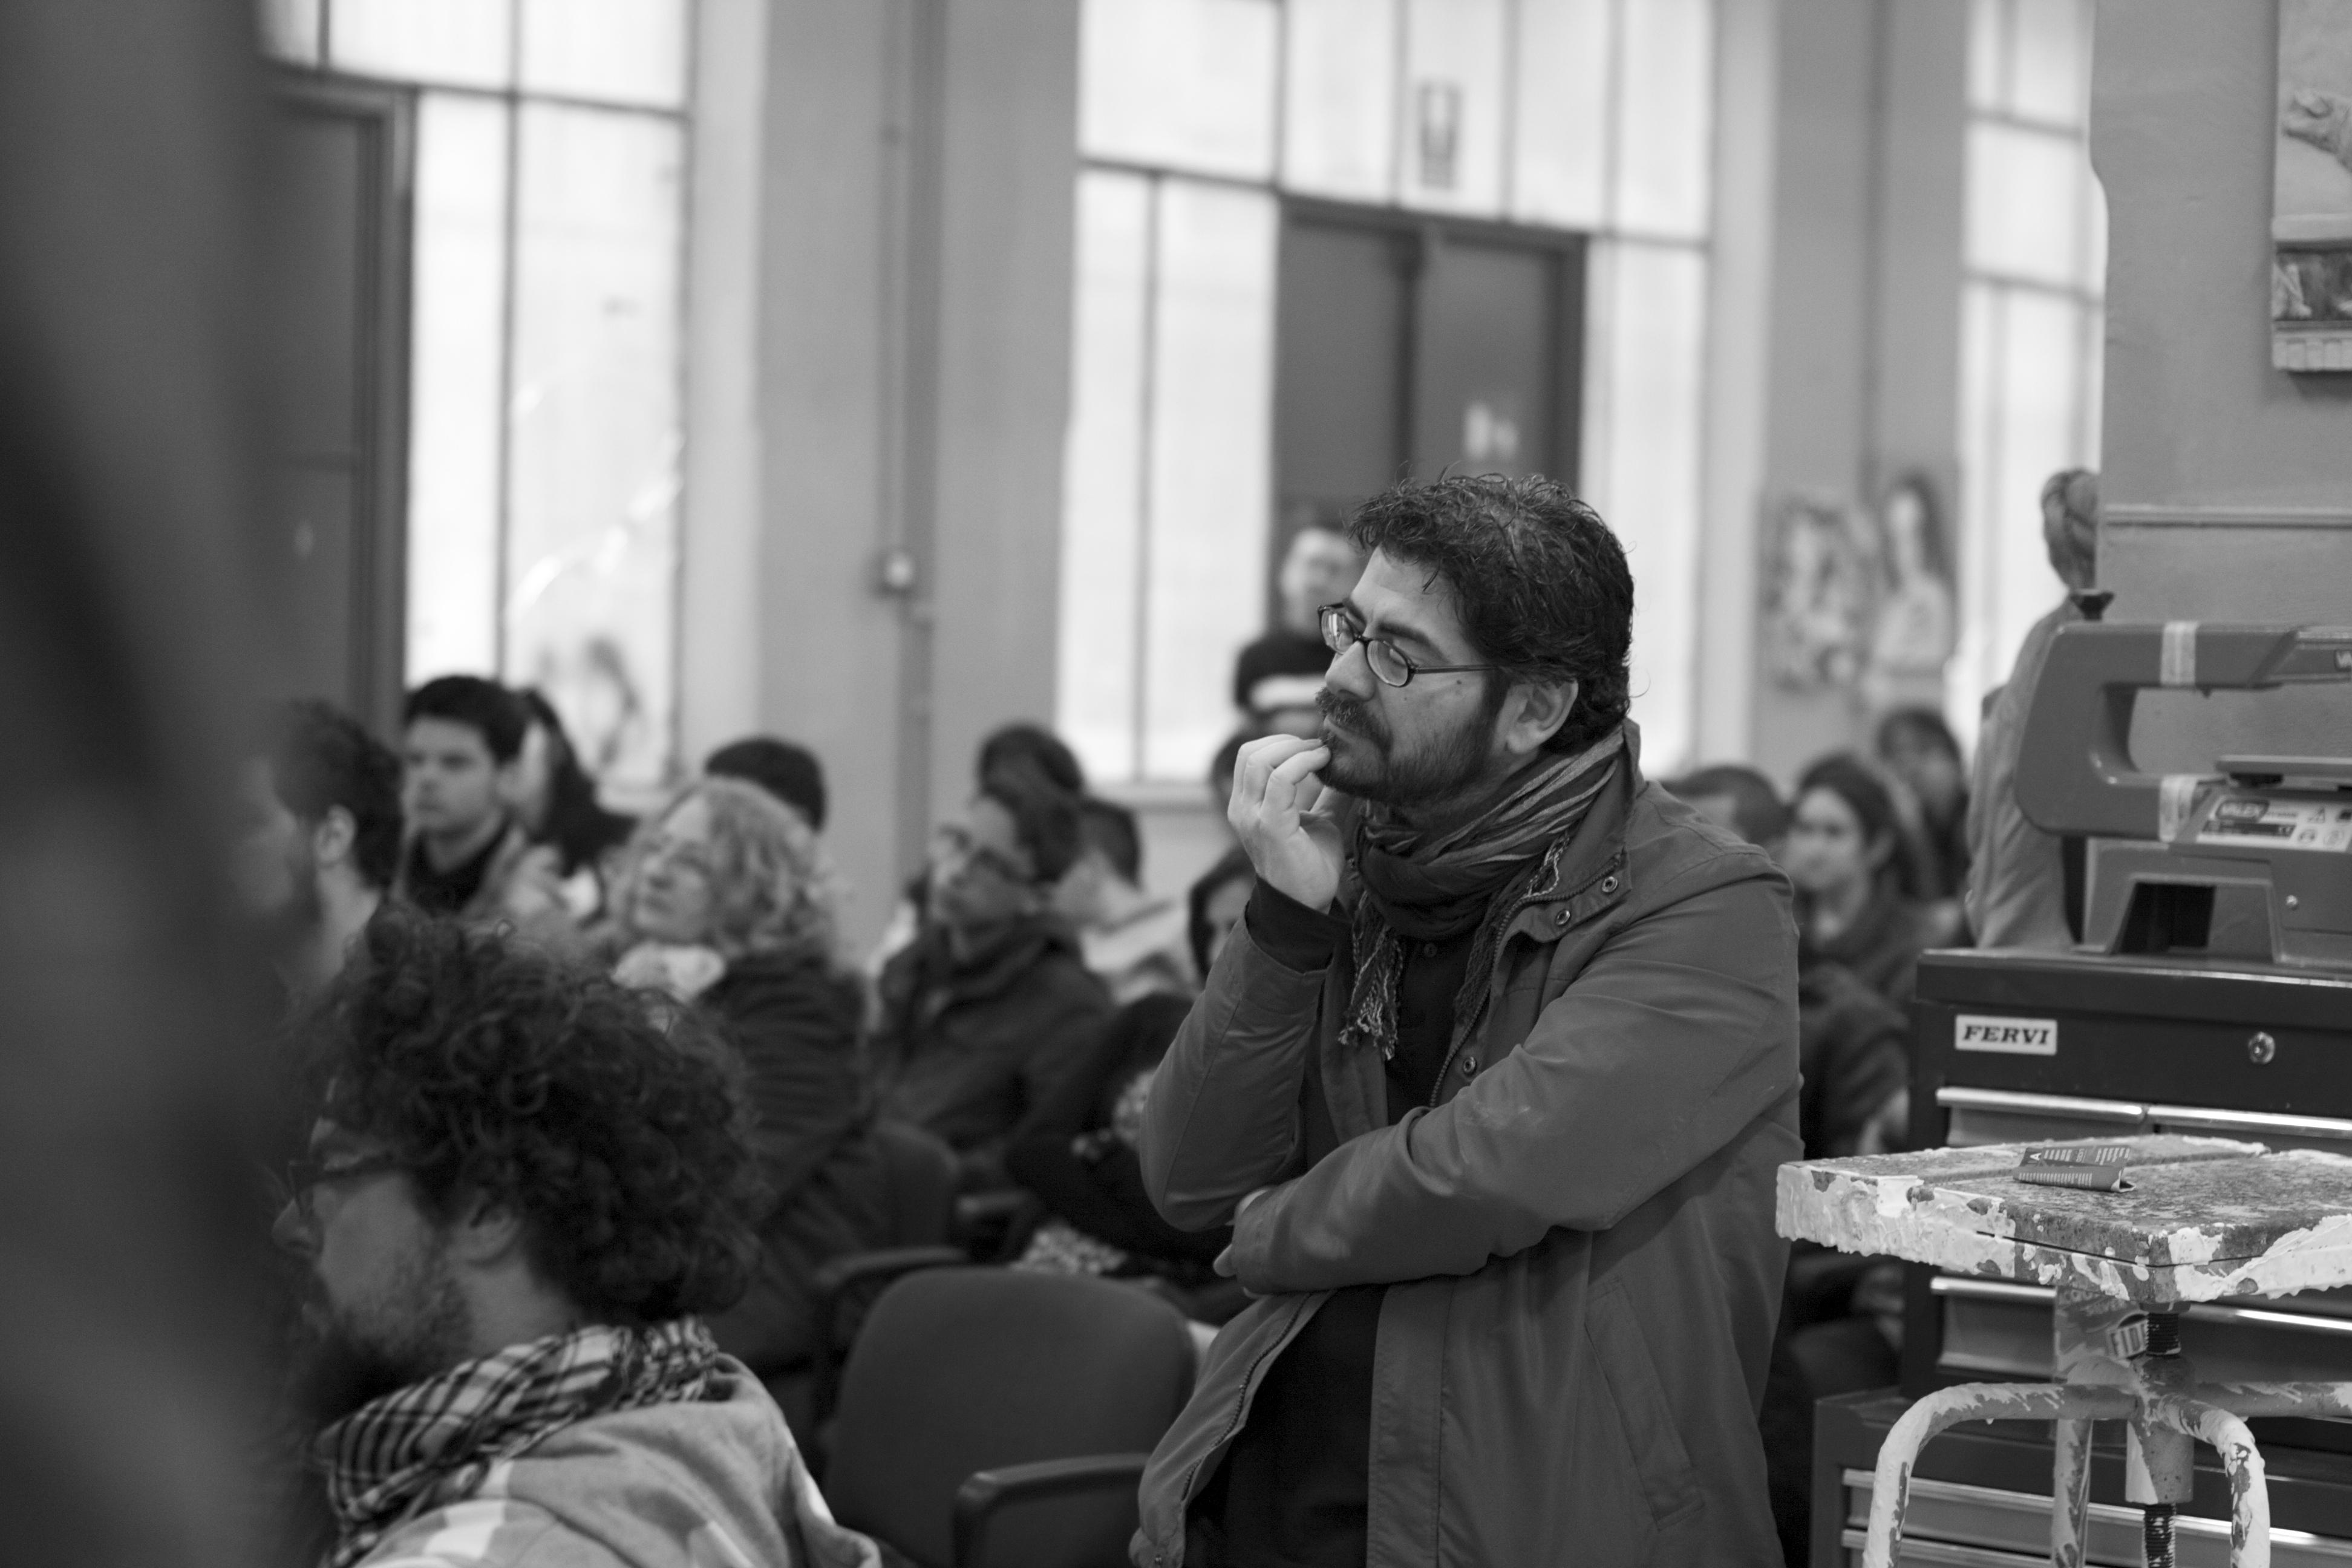 Flickr - Aron Demetz - Dialoghi e materia - Workshop a cura di Franco Reina03